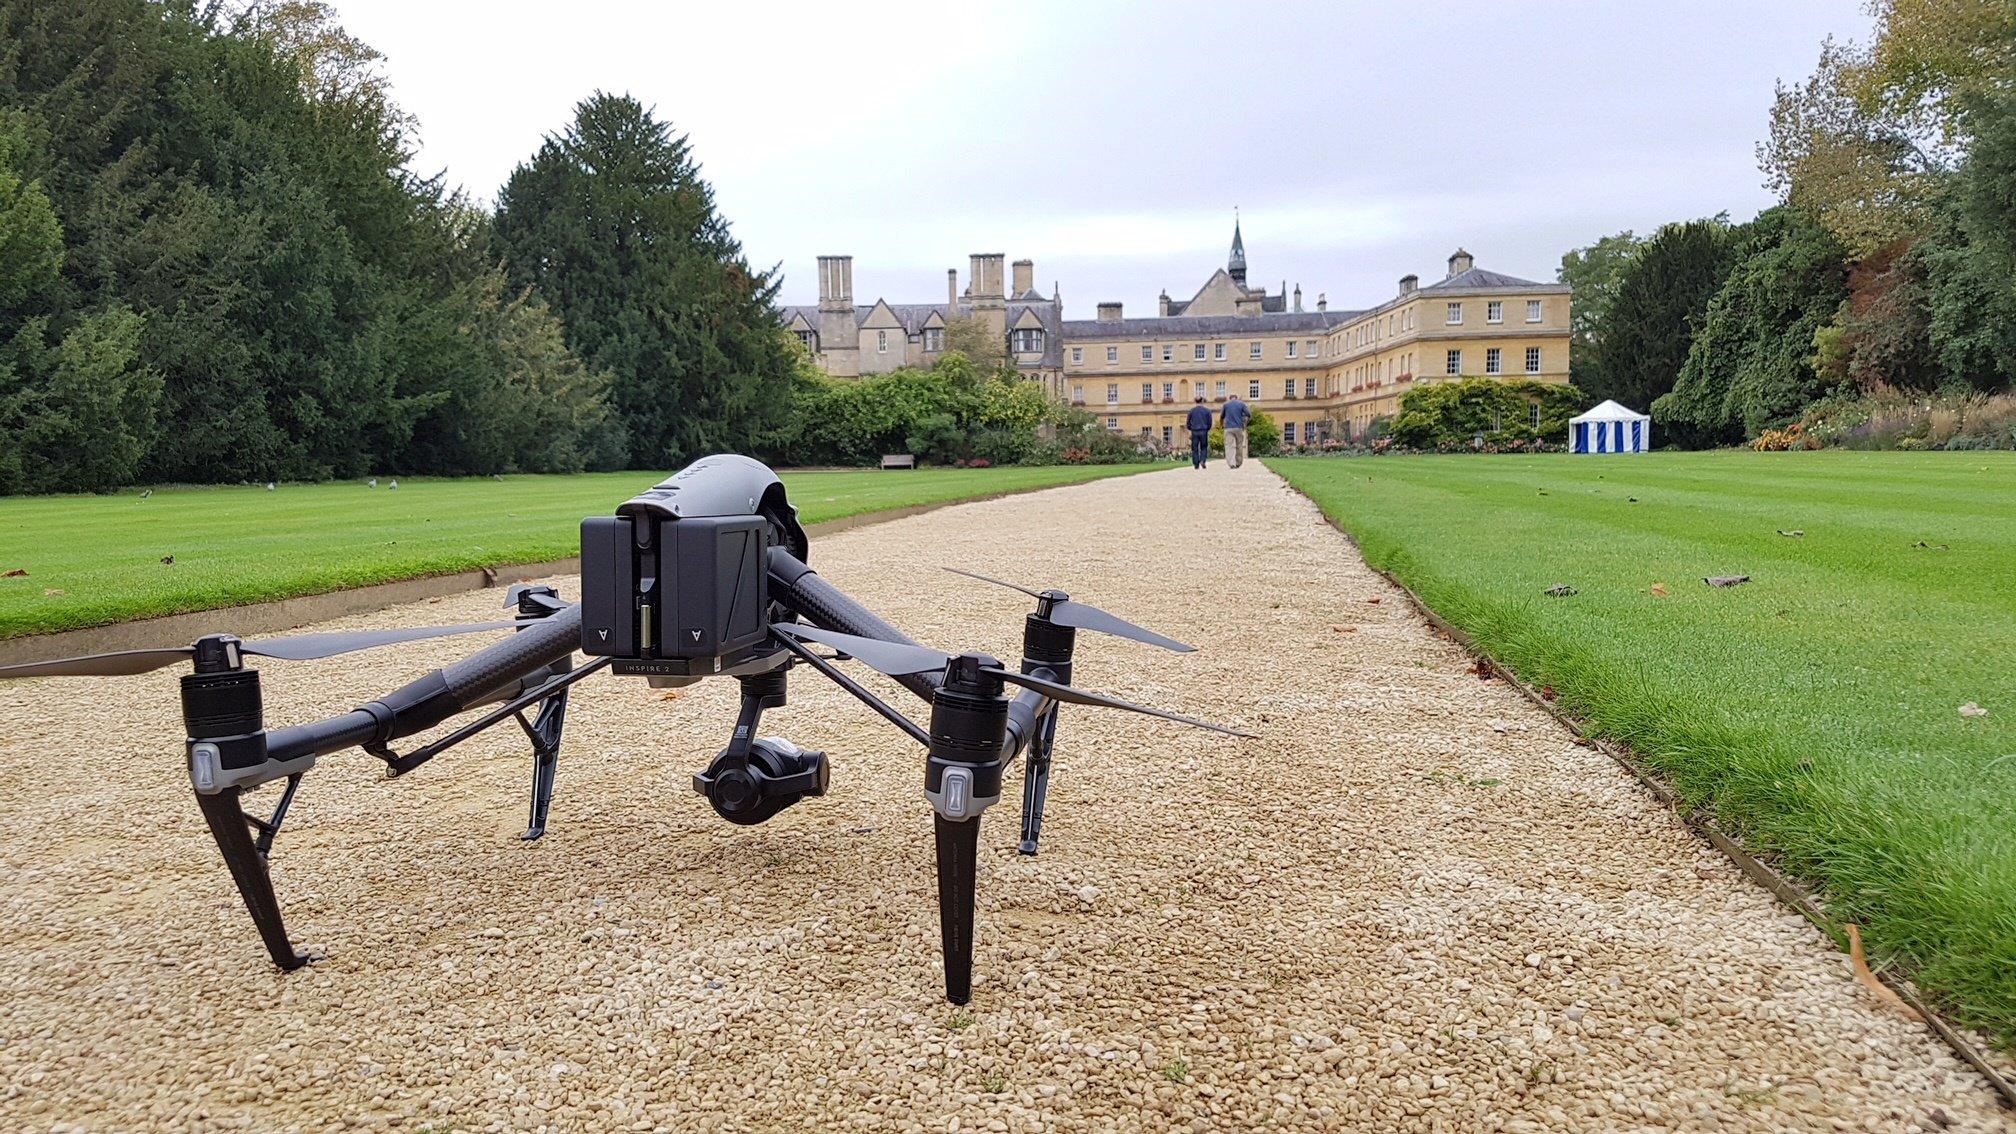 DJI Inspire 2 Drone at Oxford University